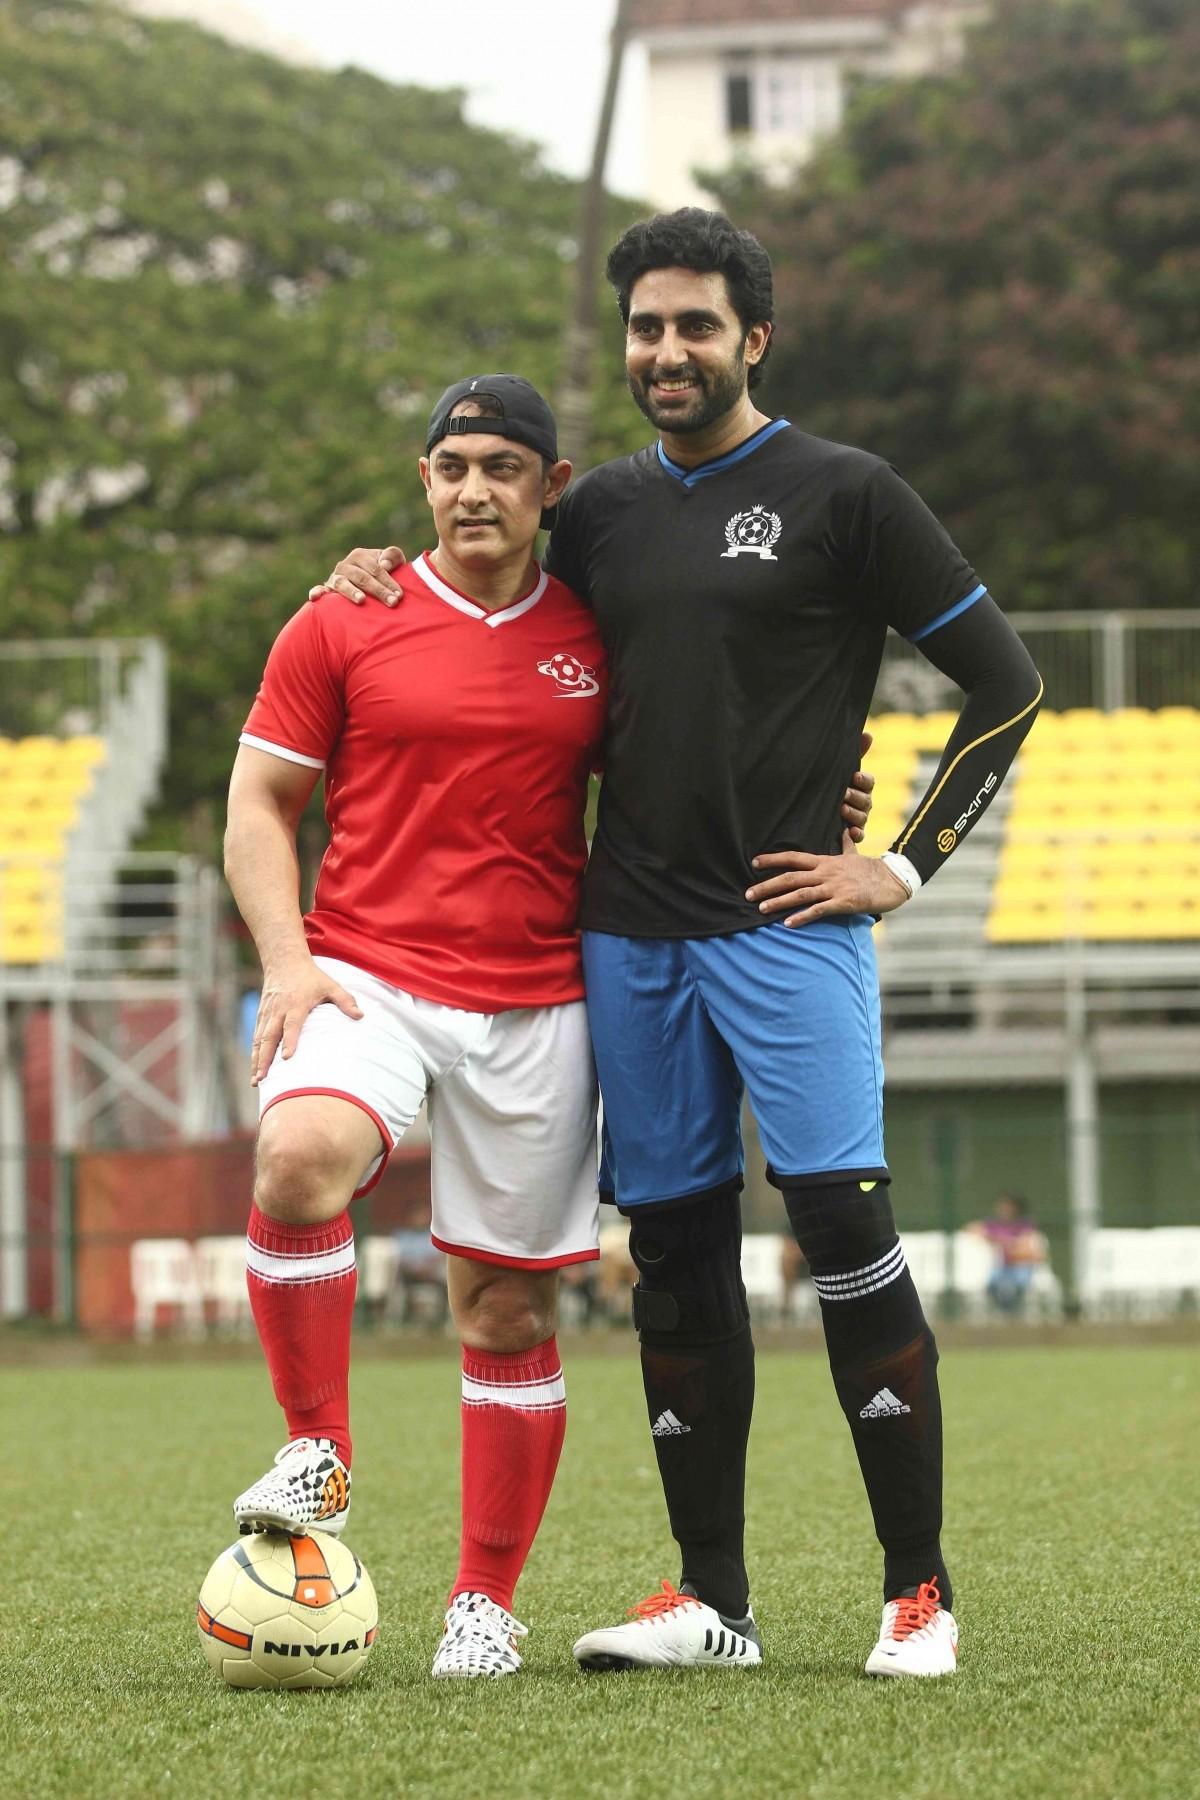 The captains, Aamir Khan and Abhishek Bachchan